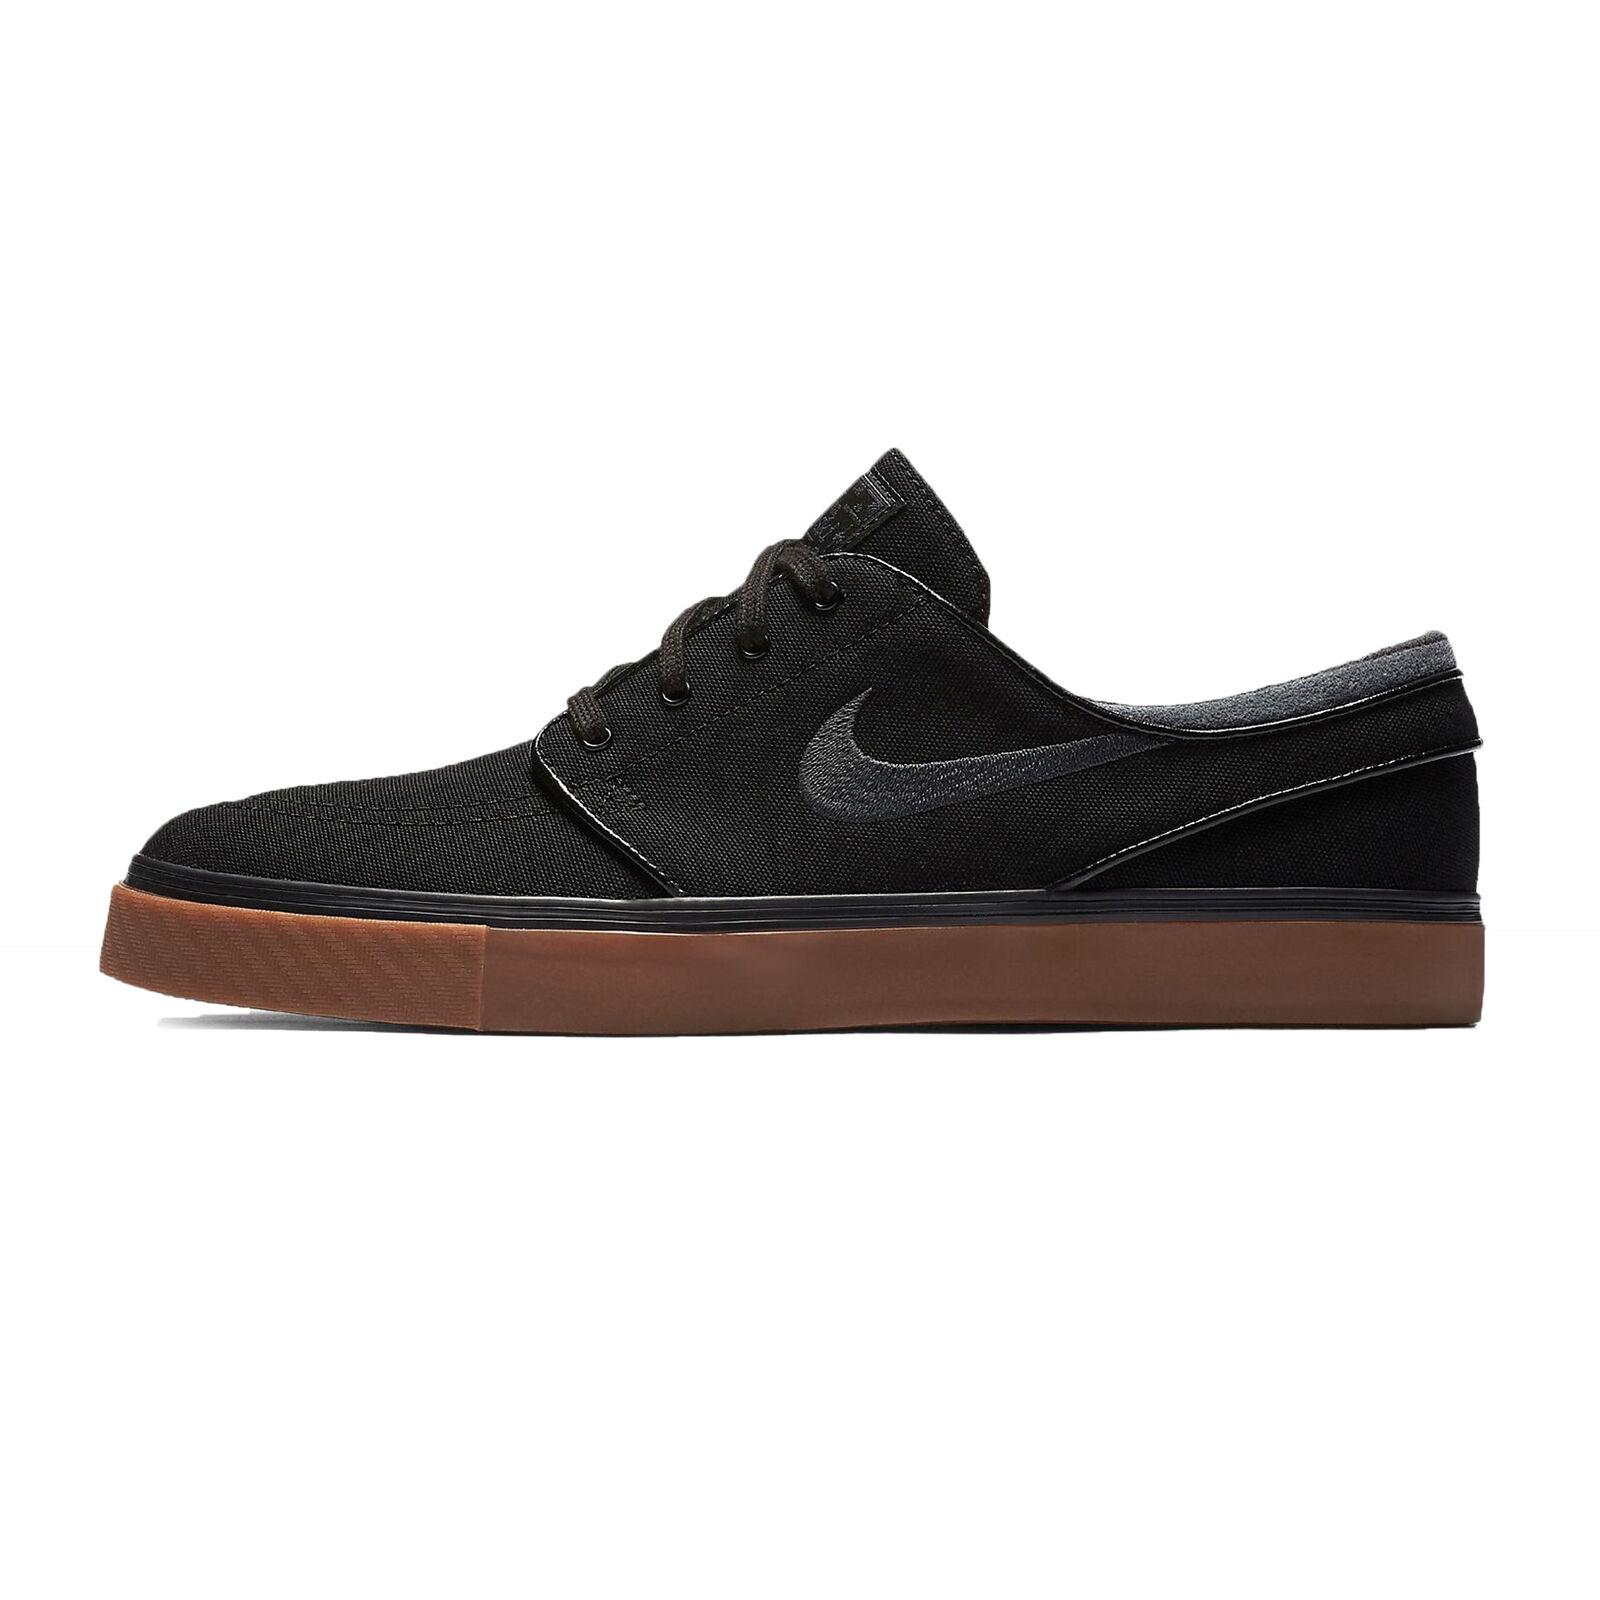 NIKE ZOOM STEFAN JANOSKI CNVS 615957-020 Skateboard Scarpe da Ginnastica SKATER Scarpe classiche da uomo